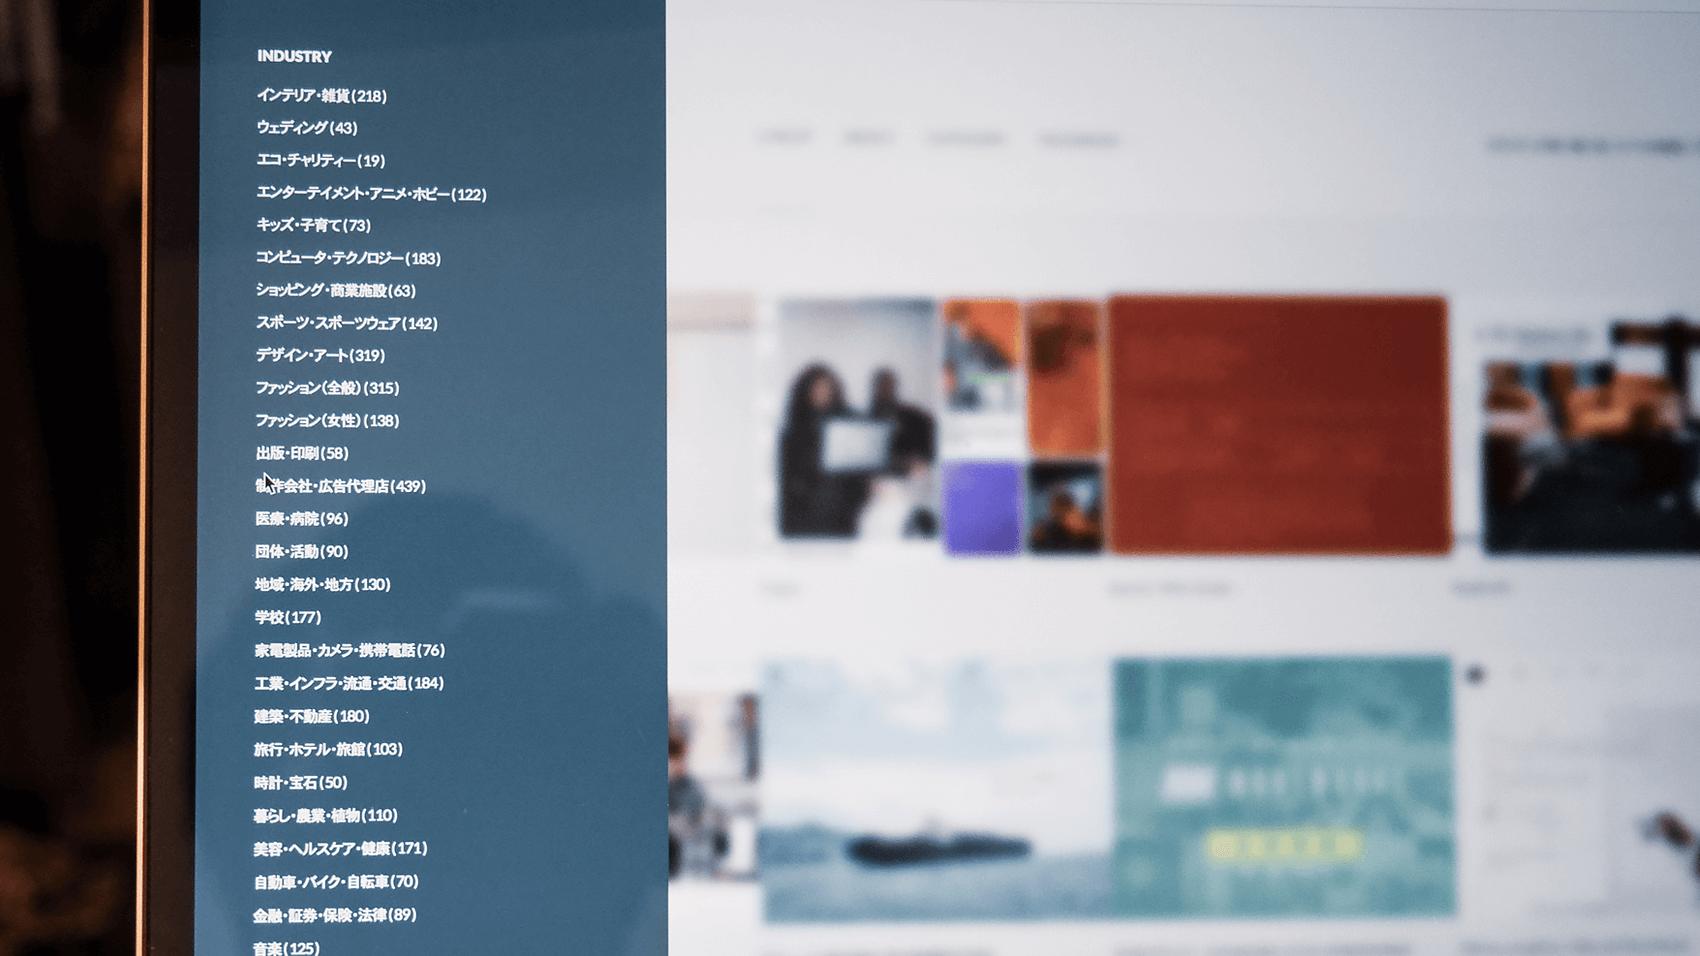 webデザインの参考に役立つギャラリーサイトをまとめてみました